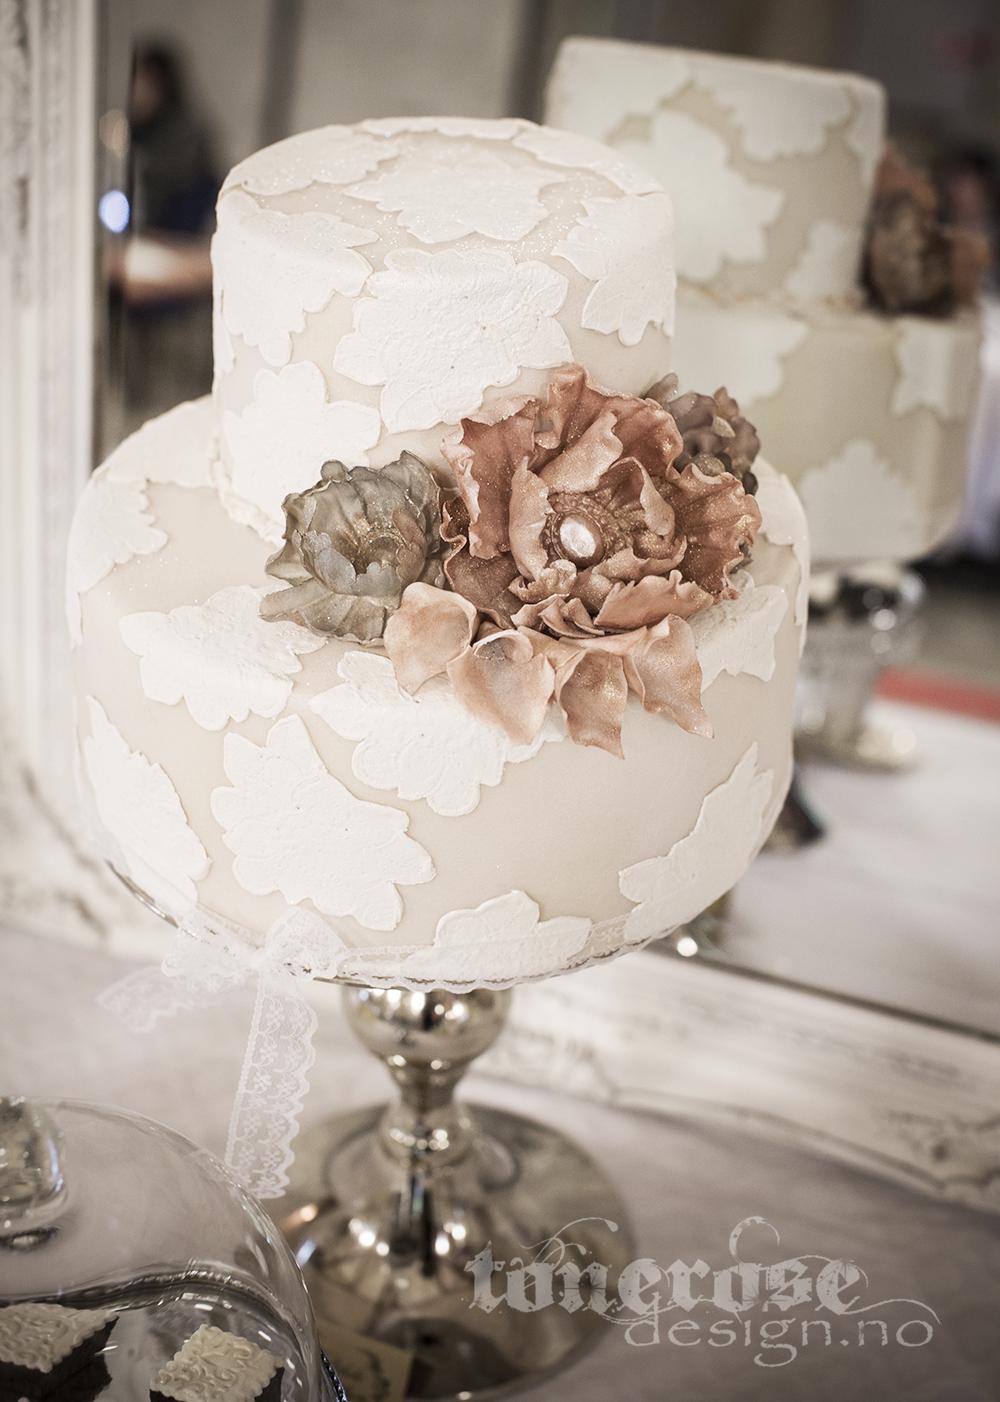 KL5A4018_bryllup_kake_dessertbord_bryllupskake_romantisk